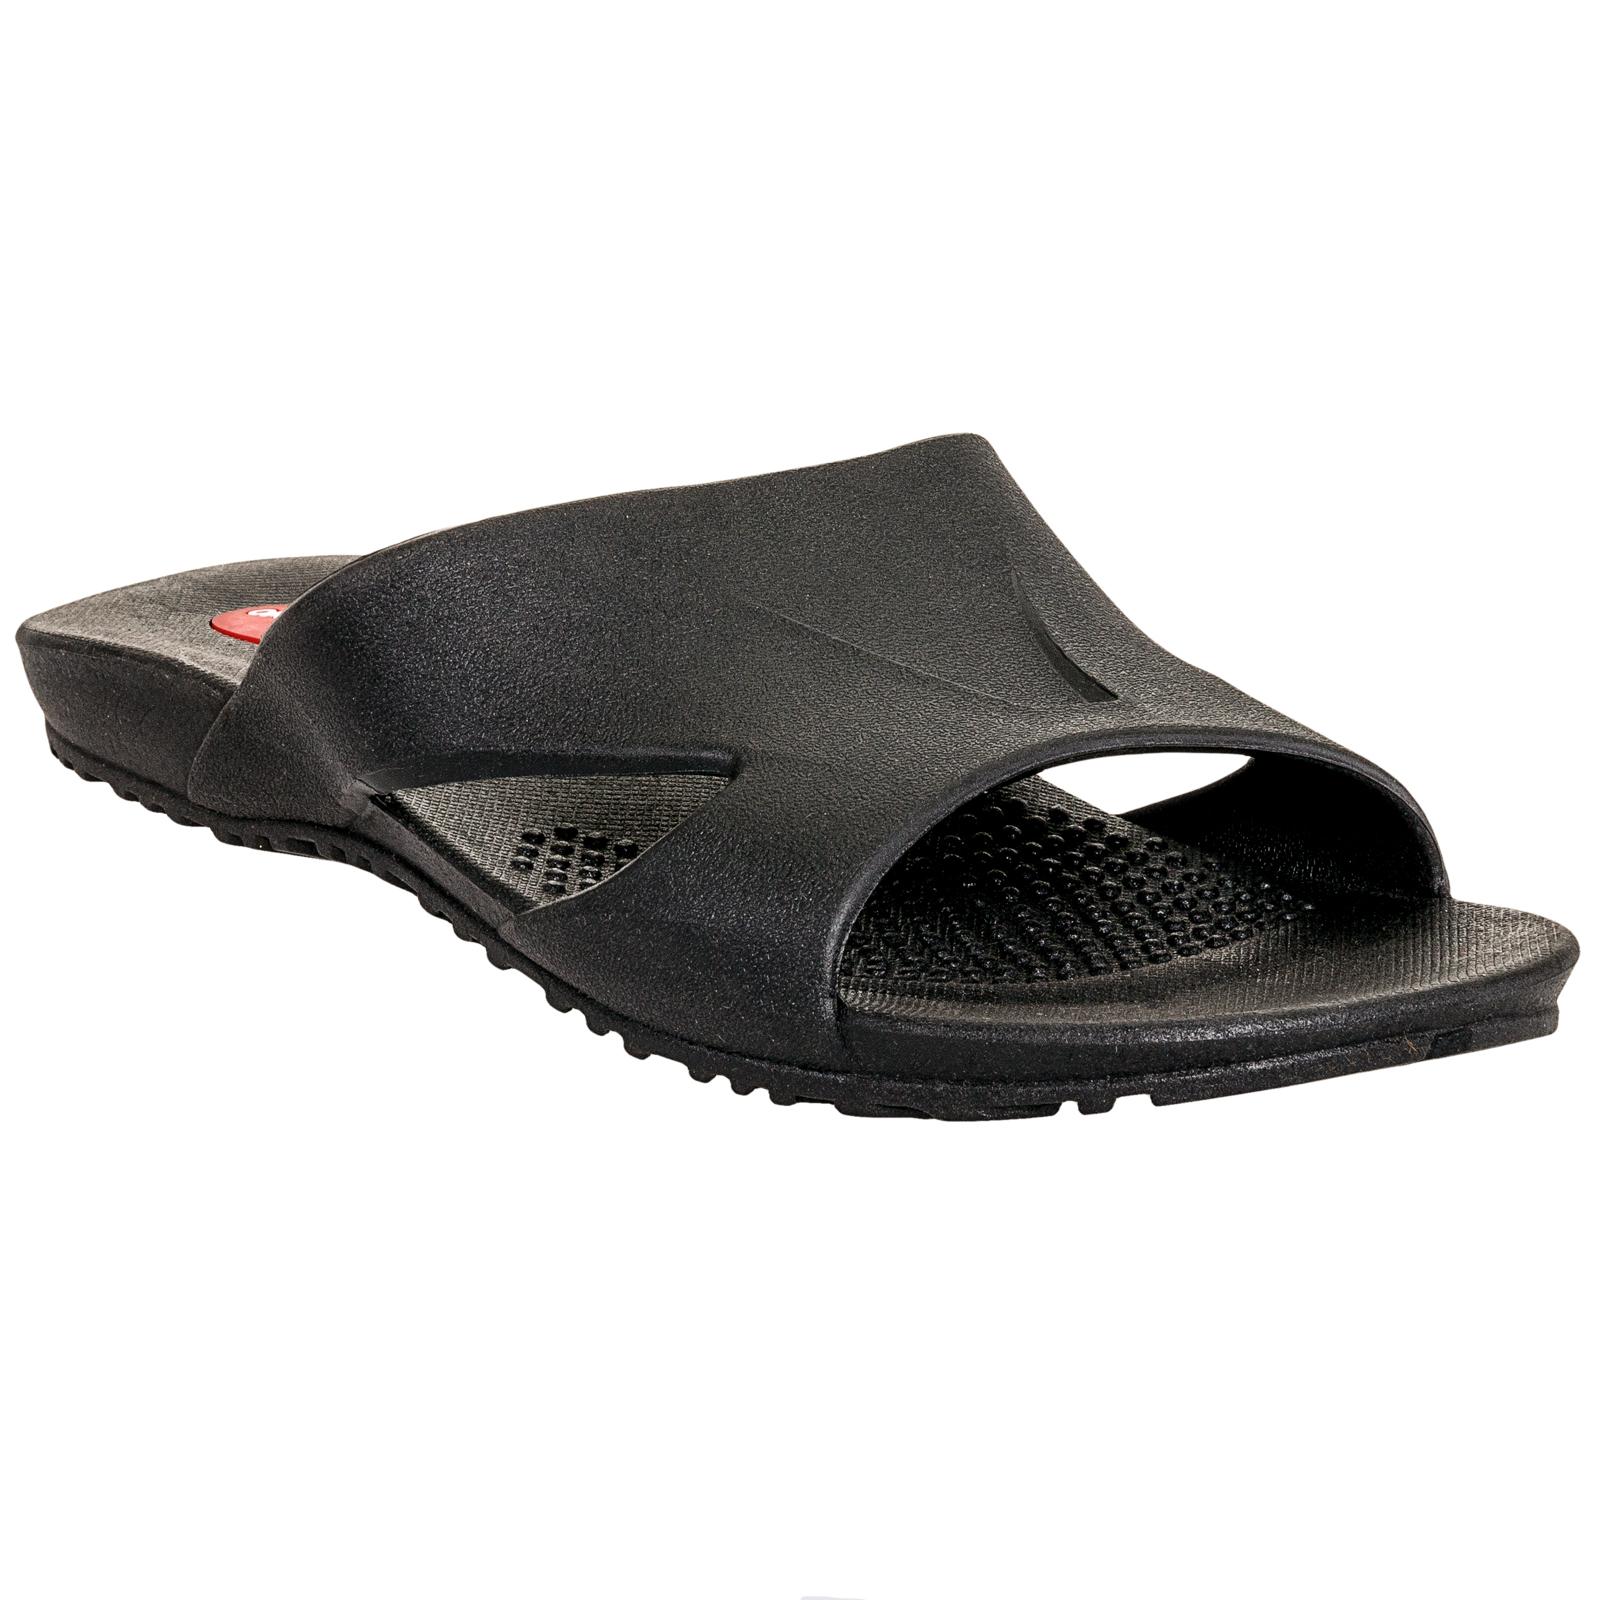 Mens Black Glide Ergonomic Waterproof Massaging Sandal Shoes (12-13